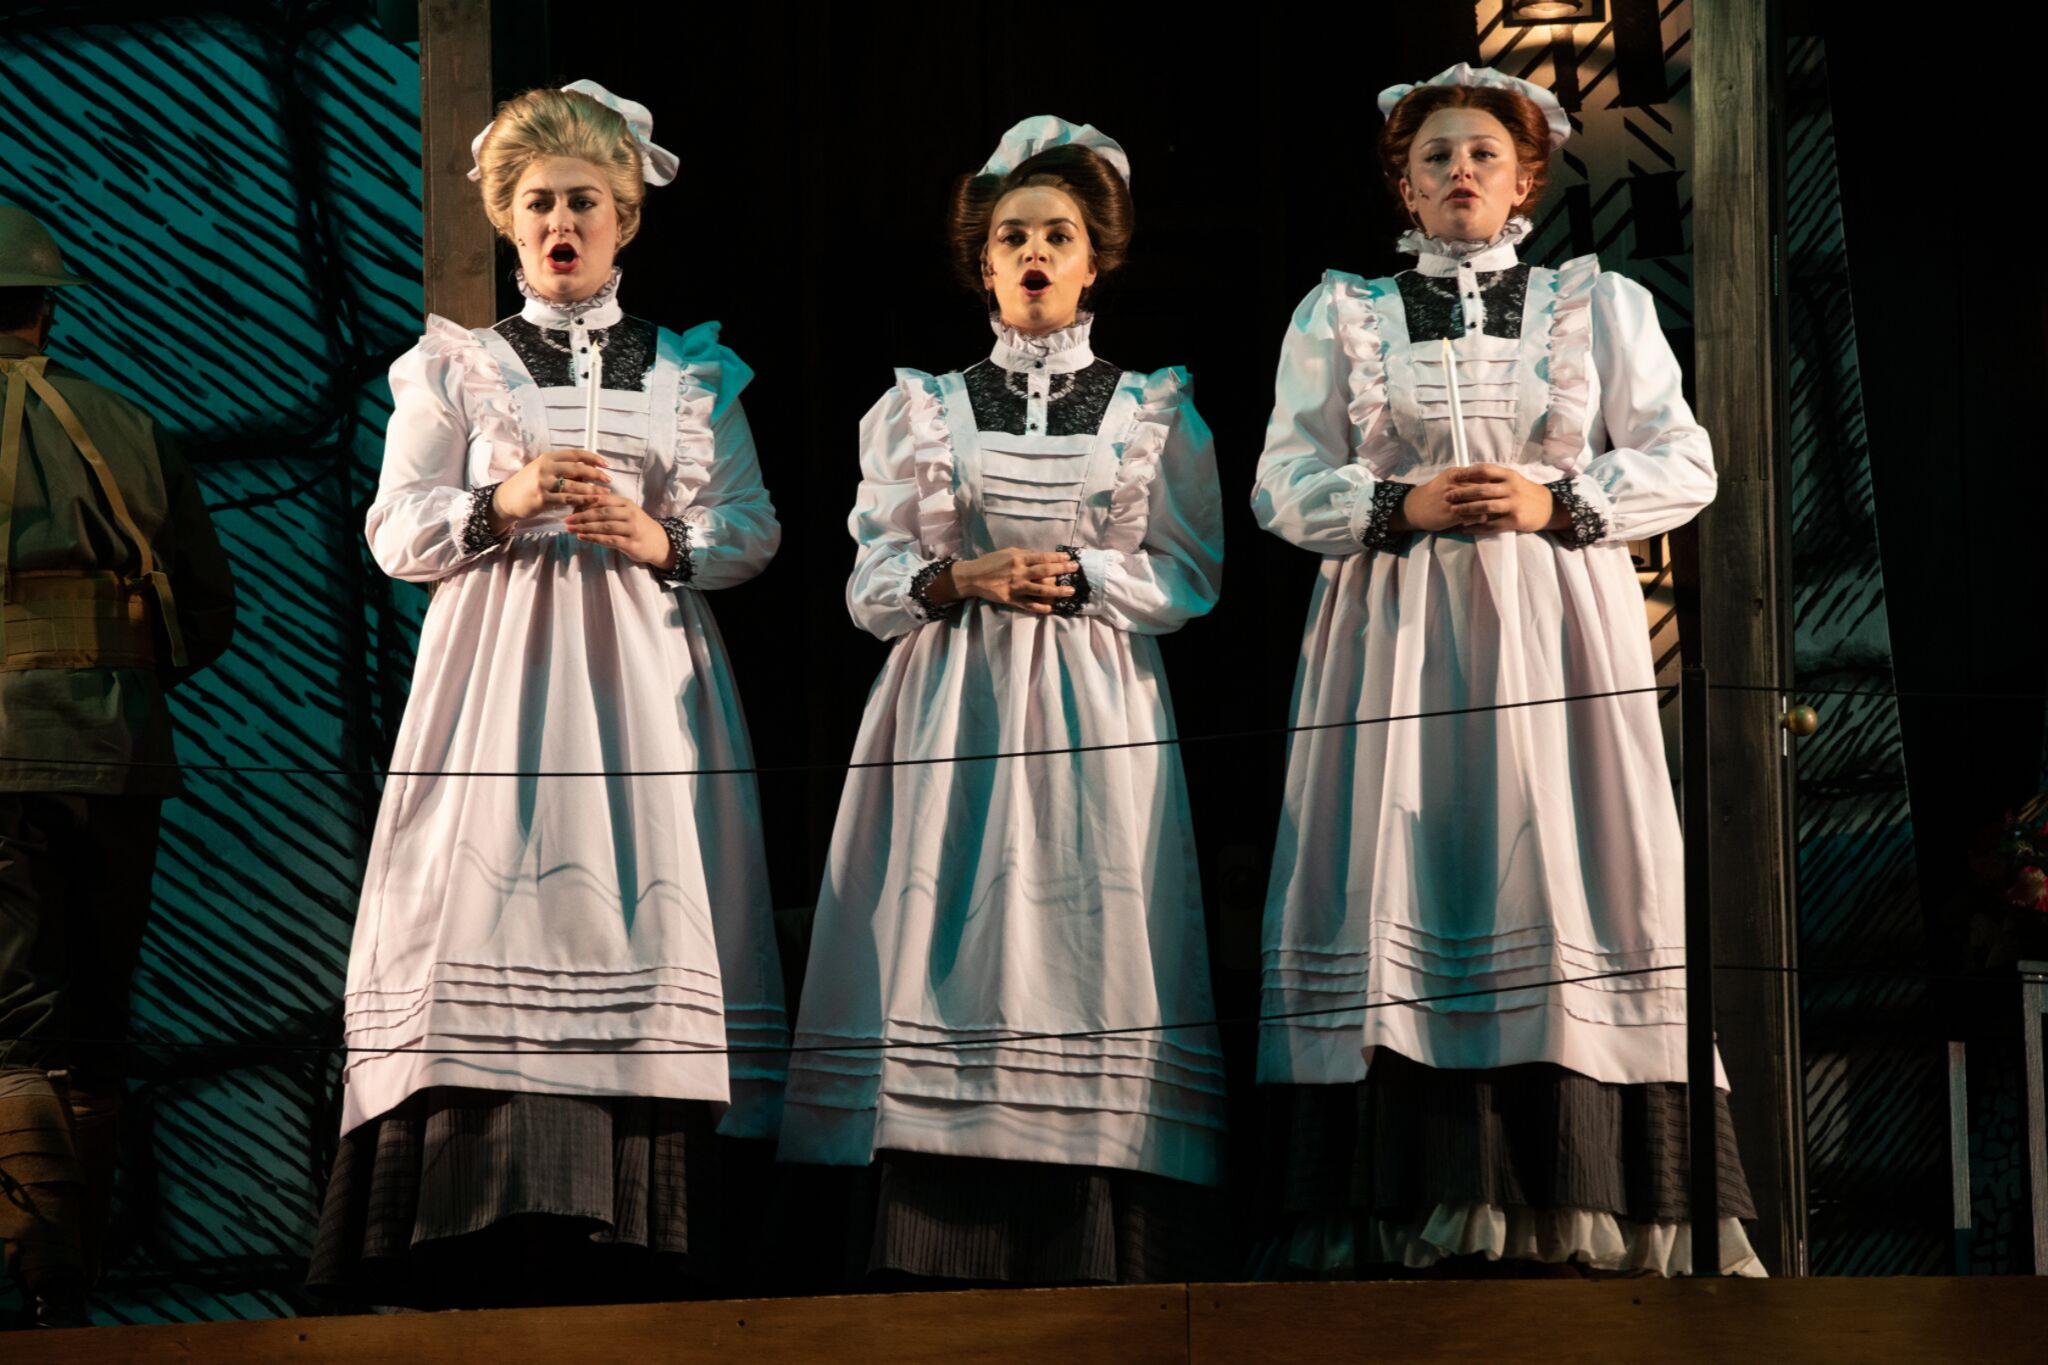 Ashley Knaack (Lady of Court), Erika Anclade (Lady of Court) and Sarah Vasilevsky (Lady of Court) in Cymbeline, Shakespeare on the Common 2019-Photo by Evgenia Eliseeva